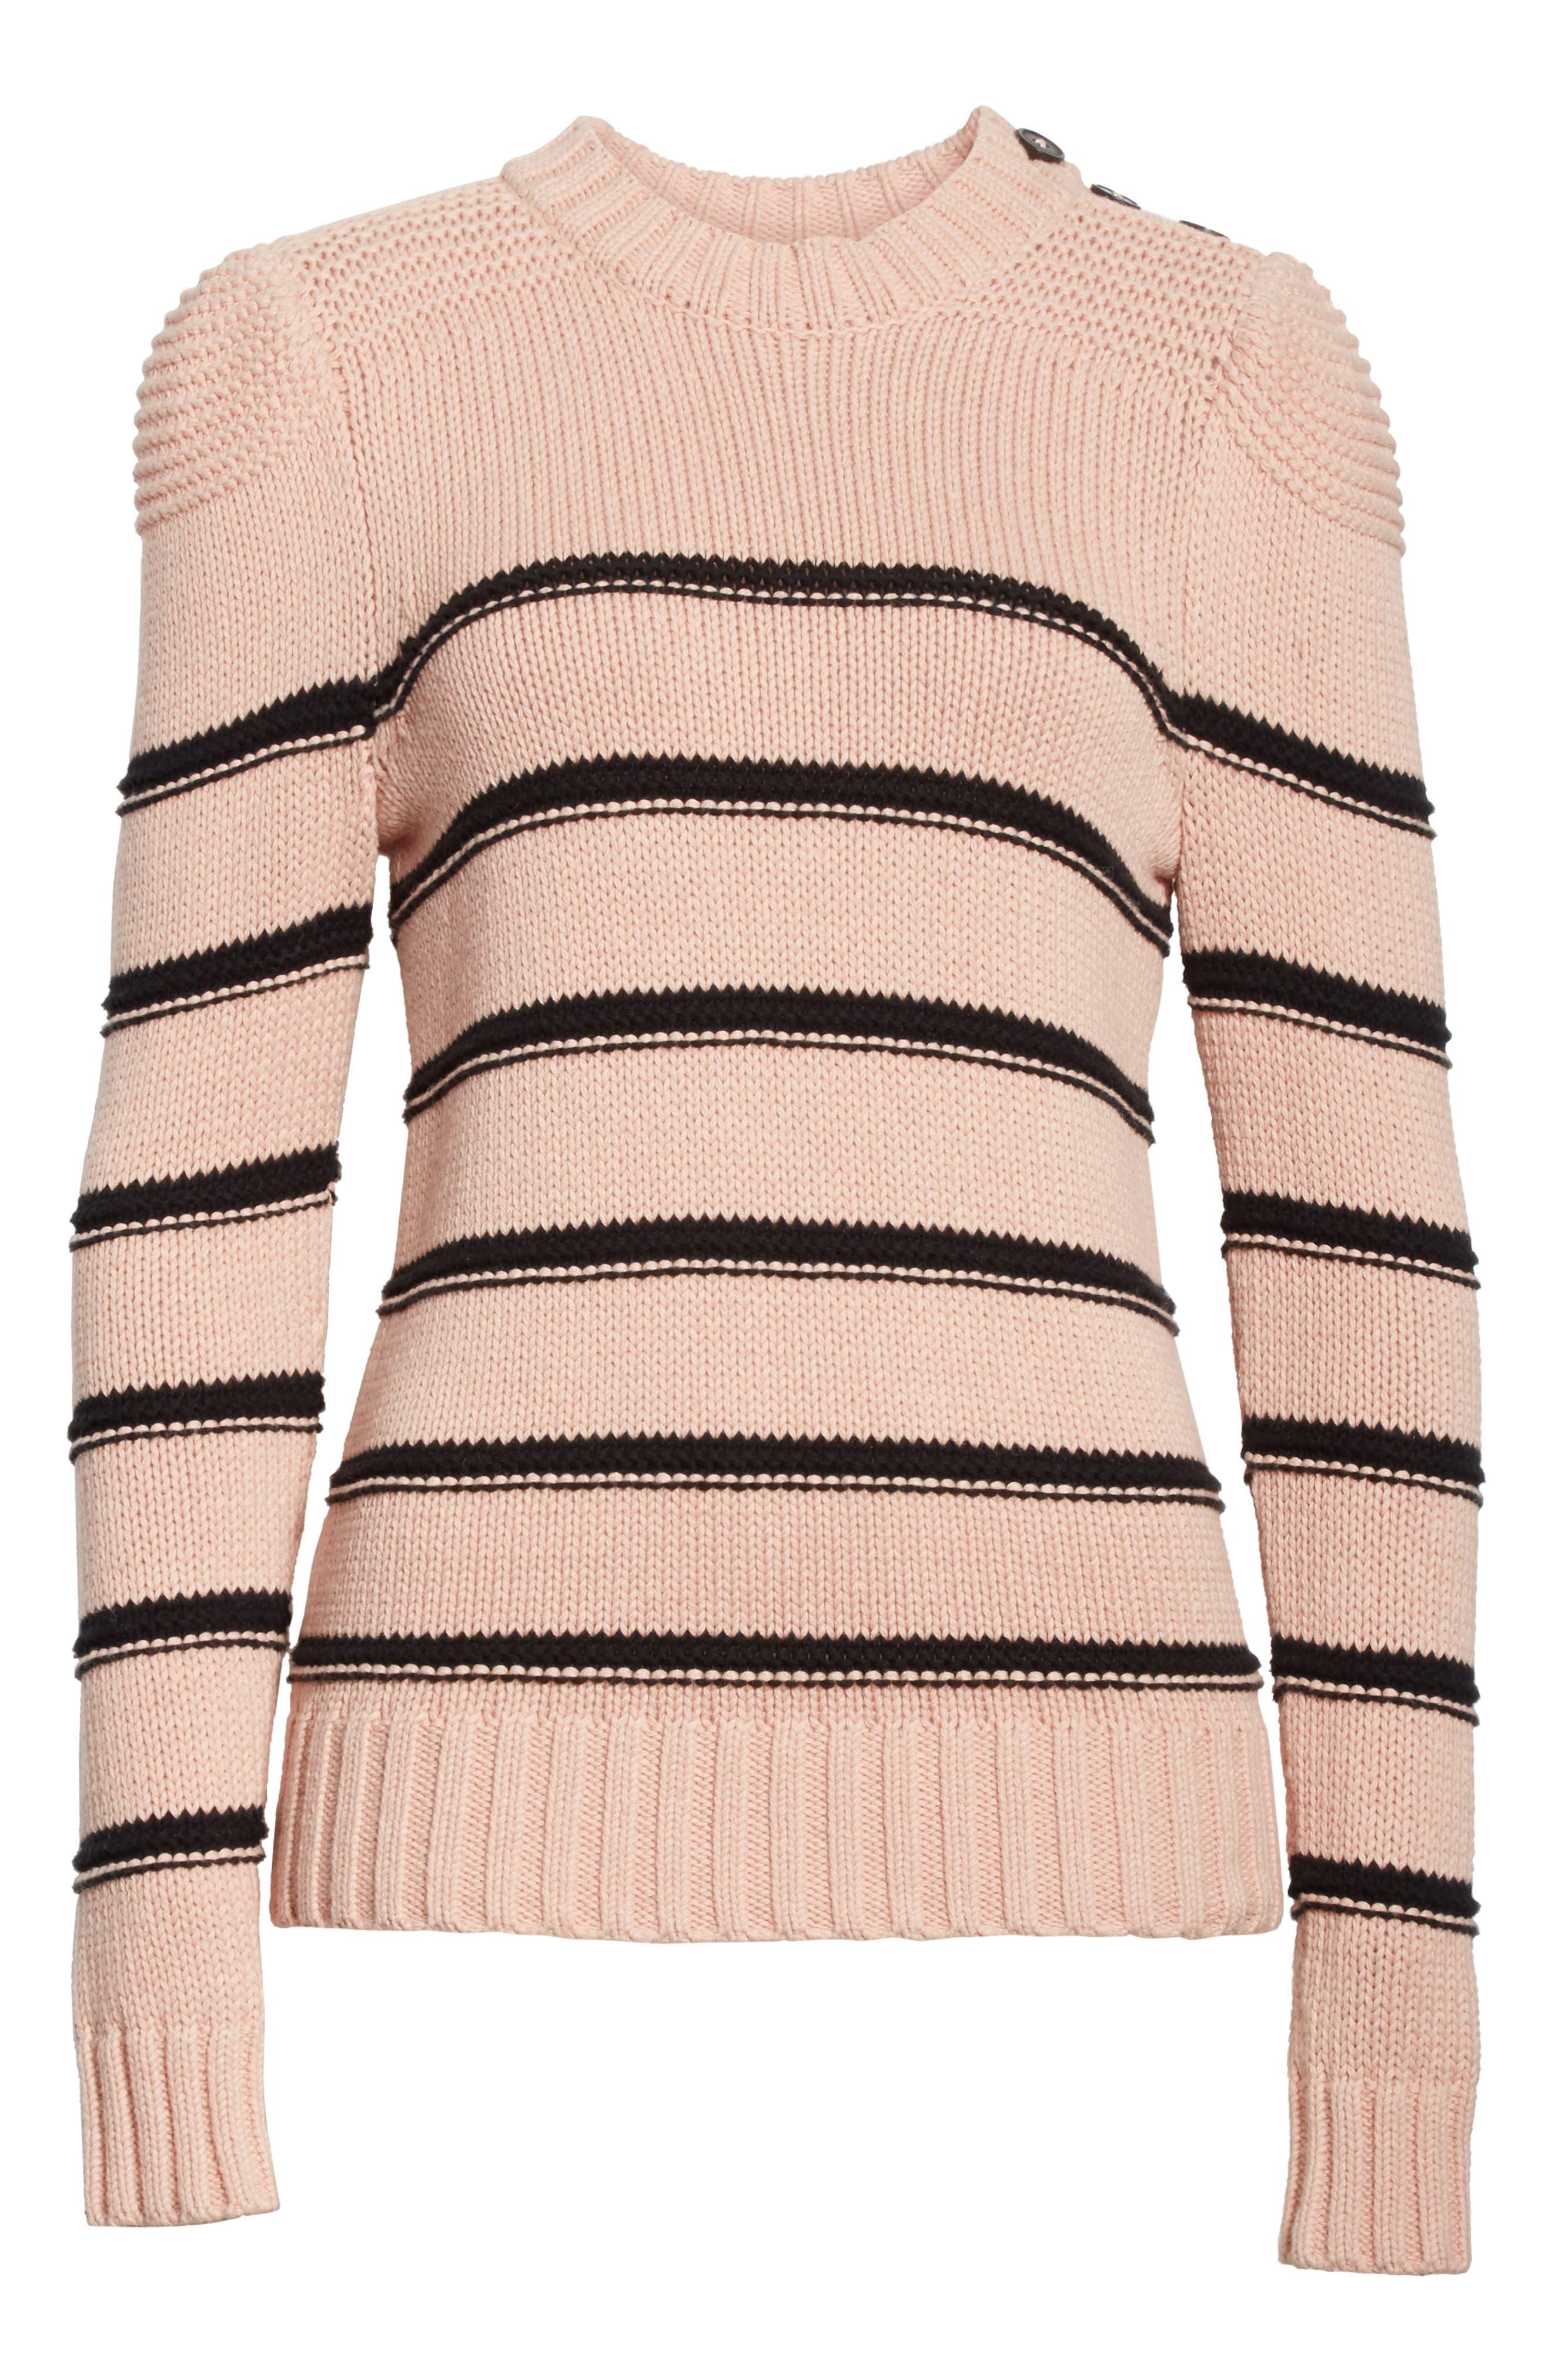 Stripe Cotton & Merino Wool Sweater,                             Alternate thumbnail 6, color,                             695